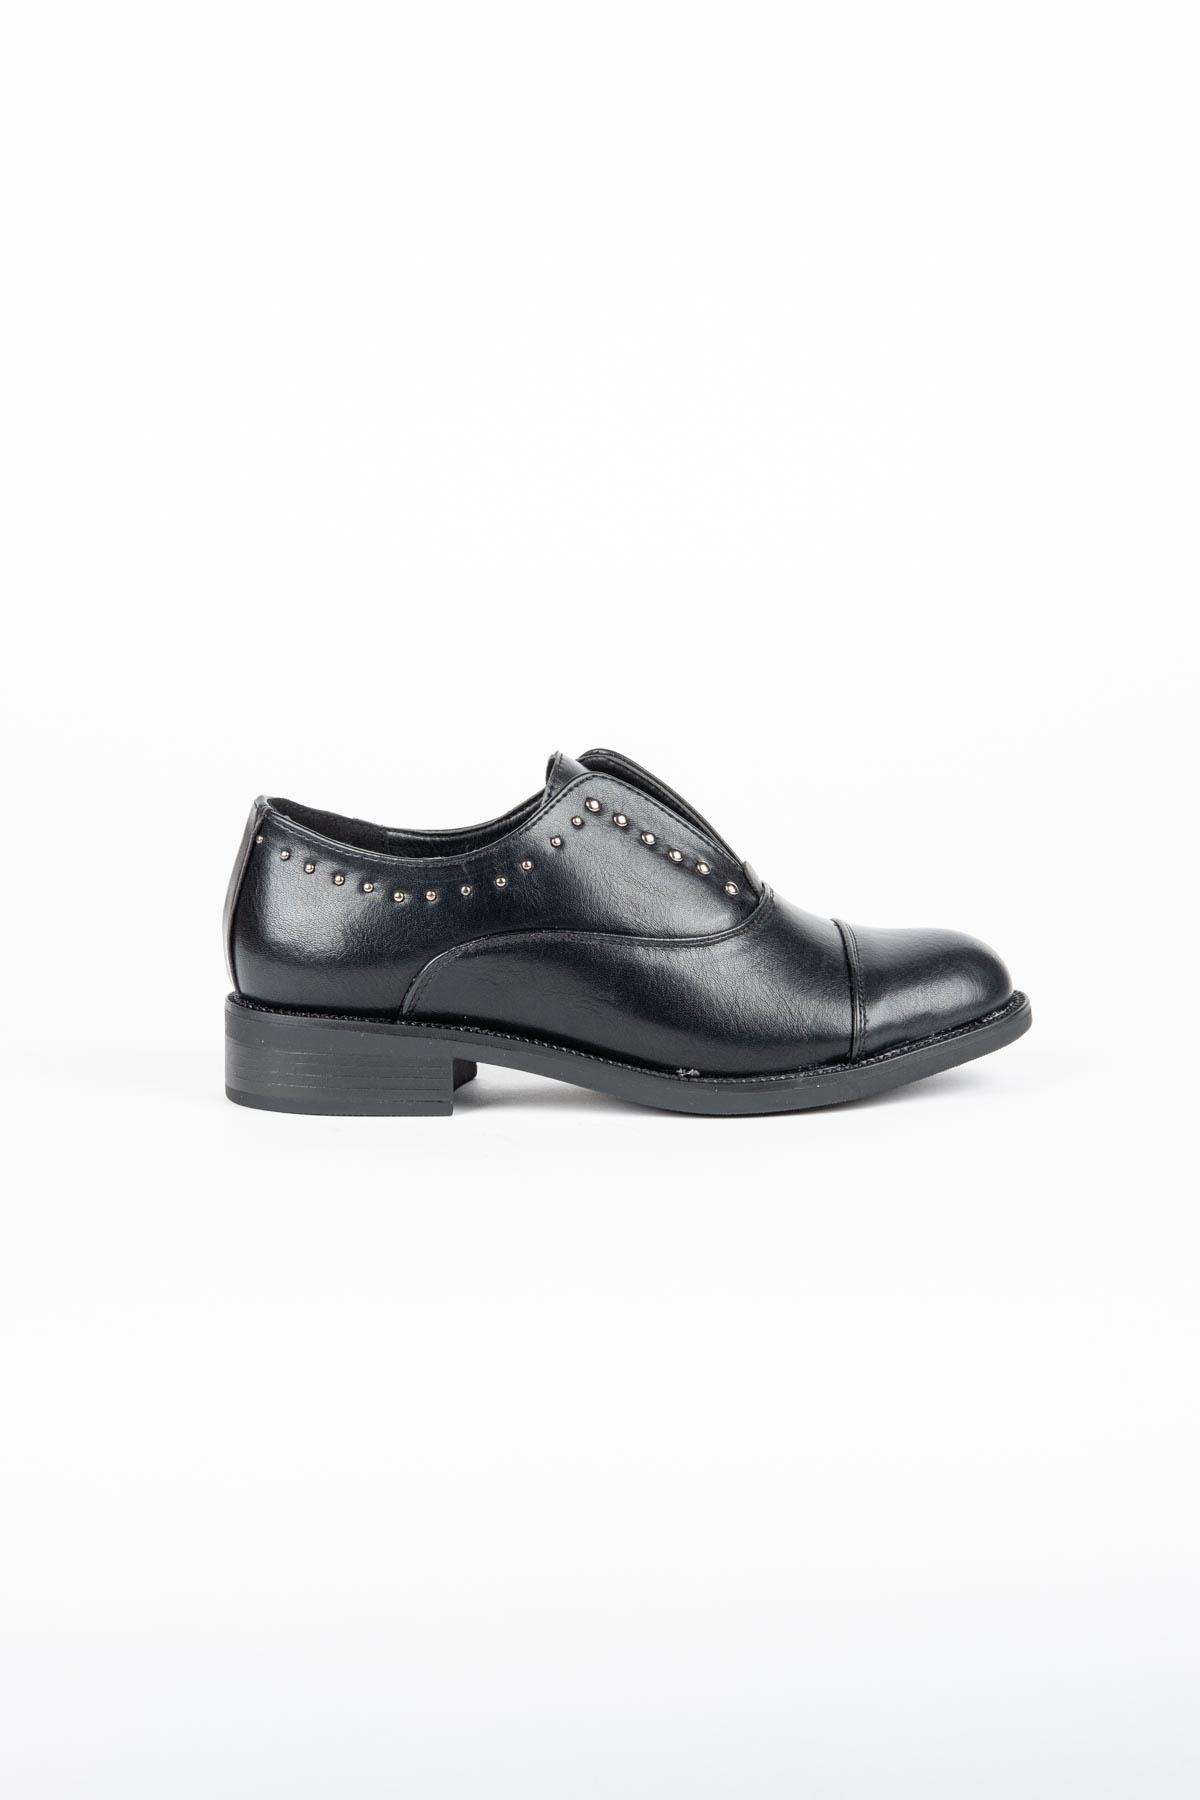 scarpa,nero